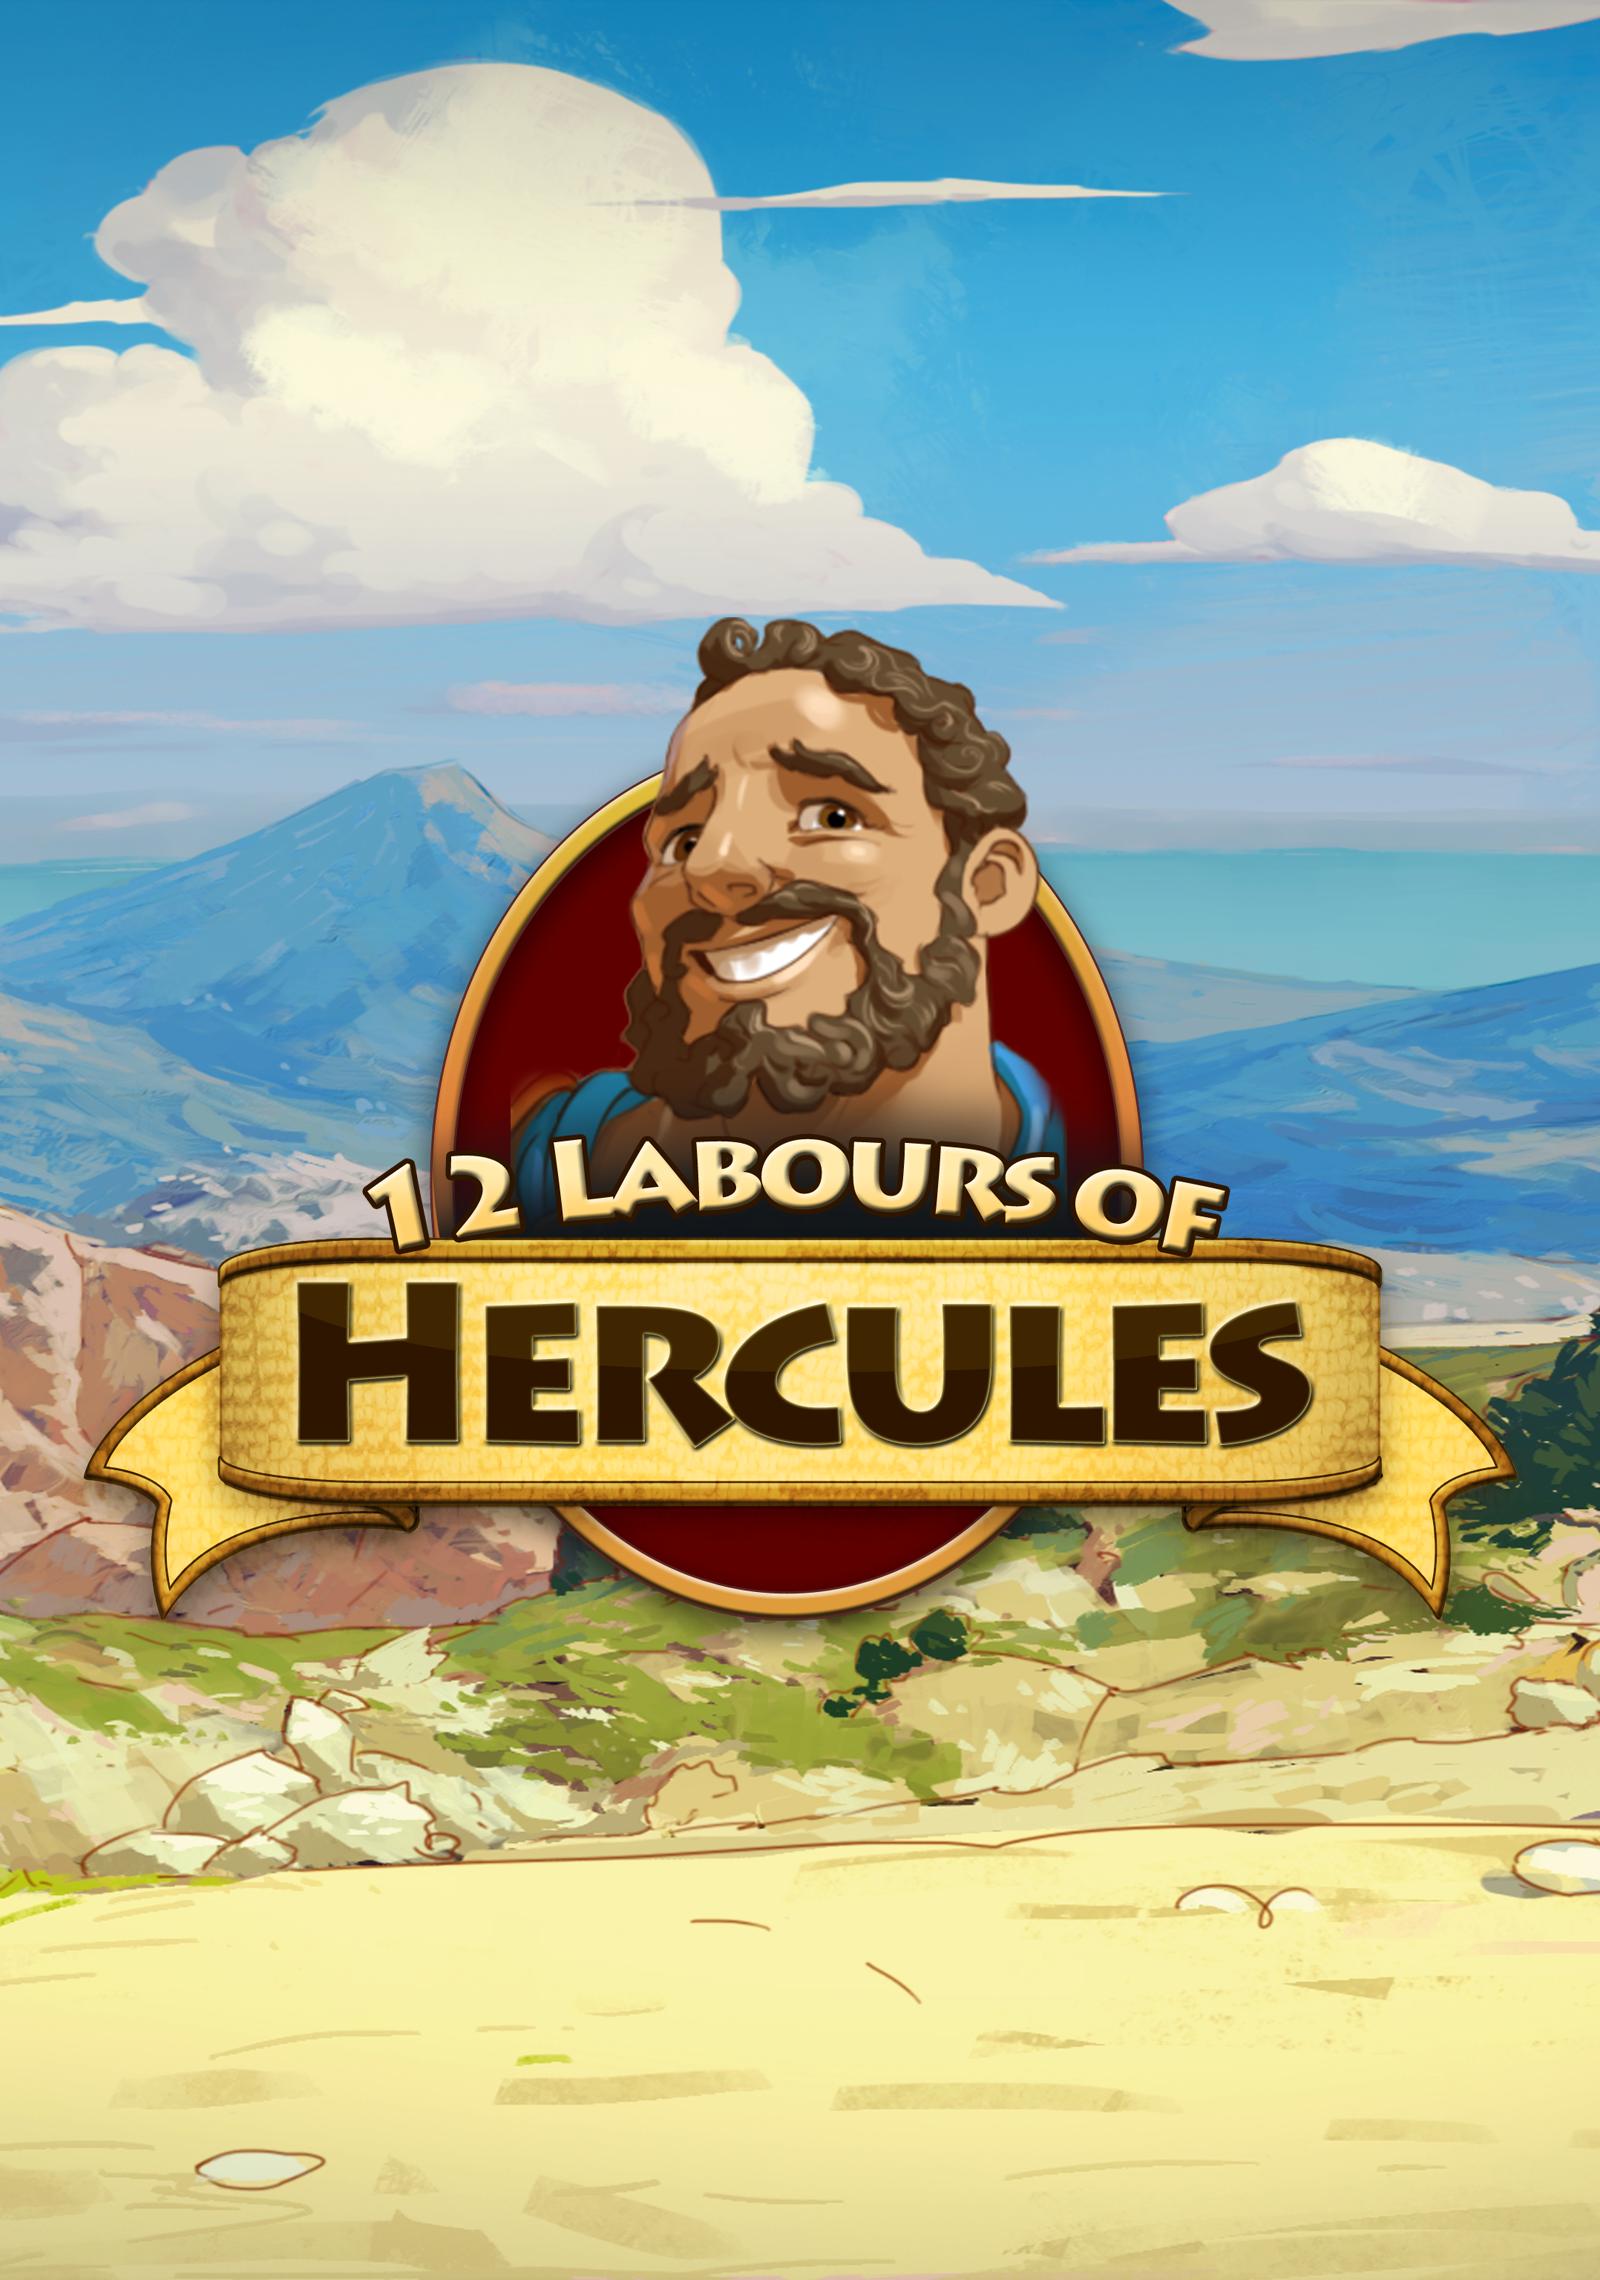 12 Labours Of Hercules Online Game Code